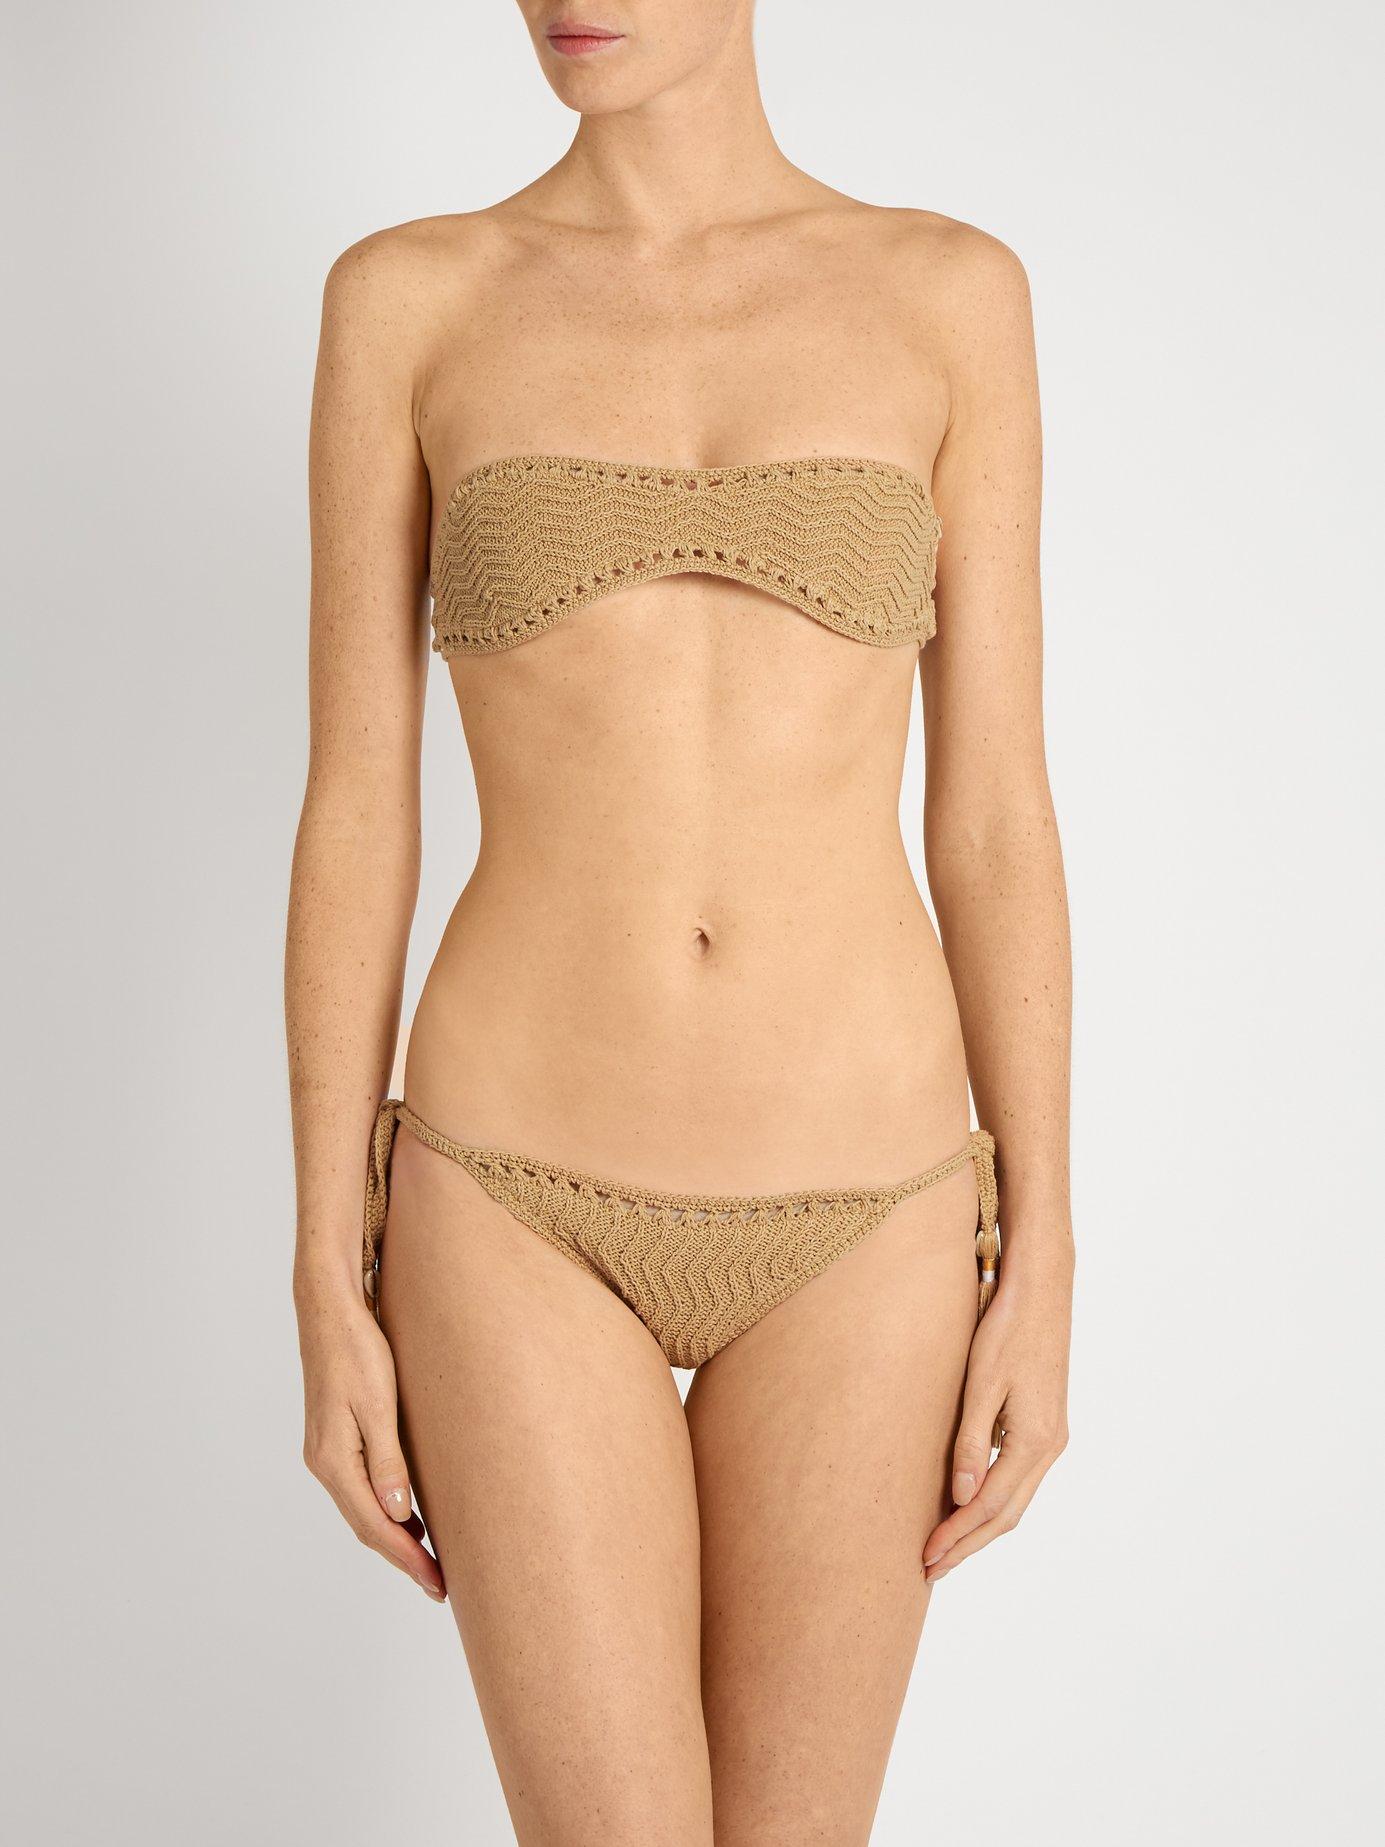 Laharia Tie-Side crochet bikini briefs by She Made Me